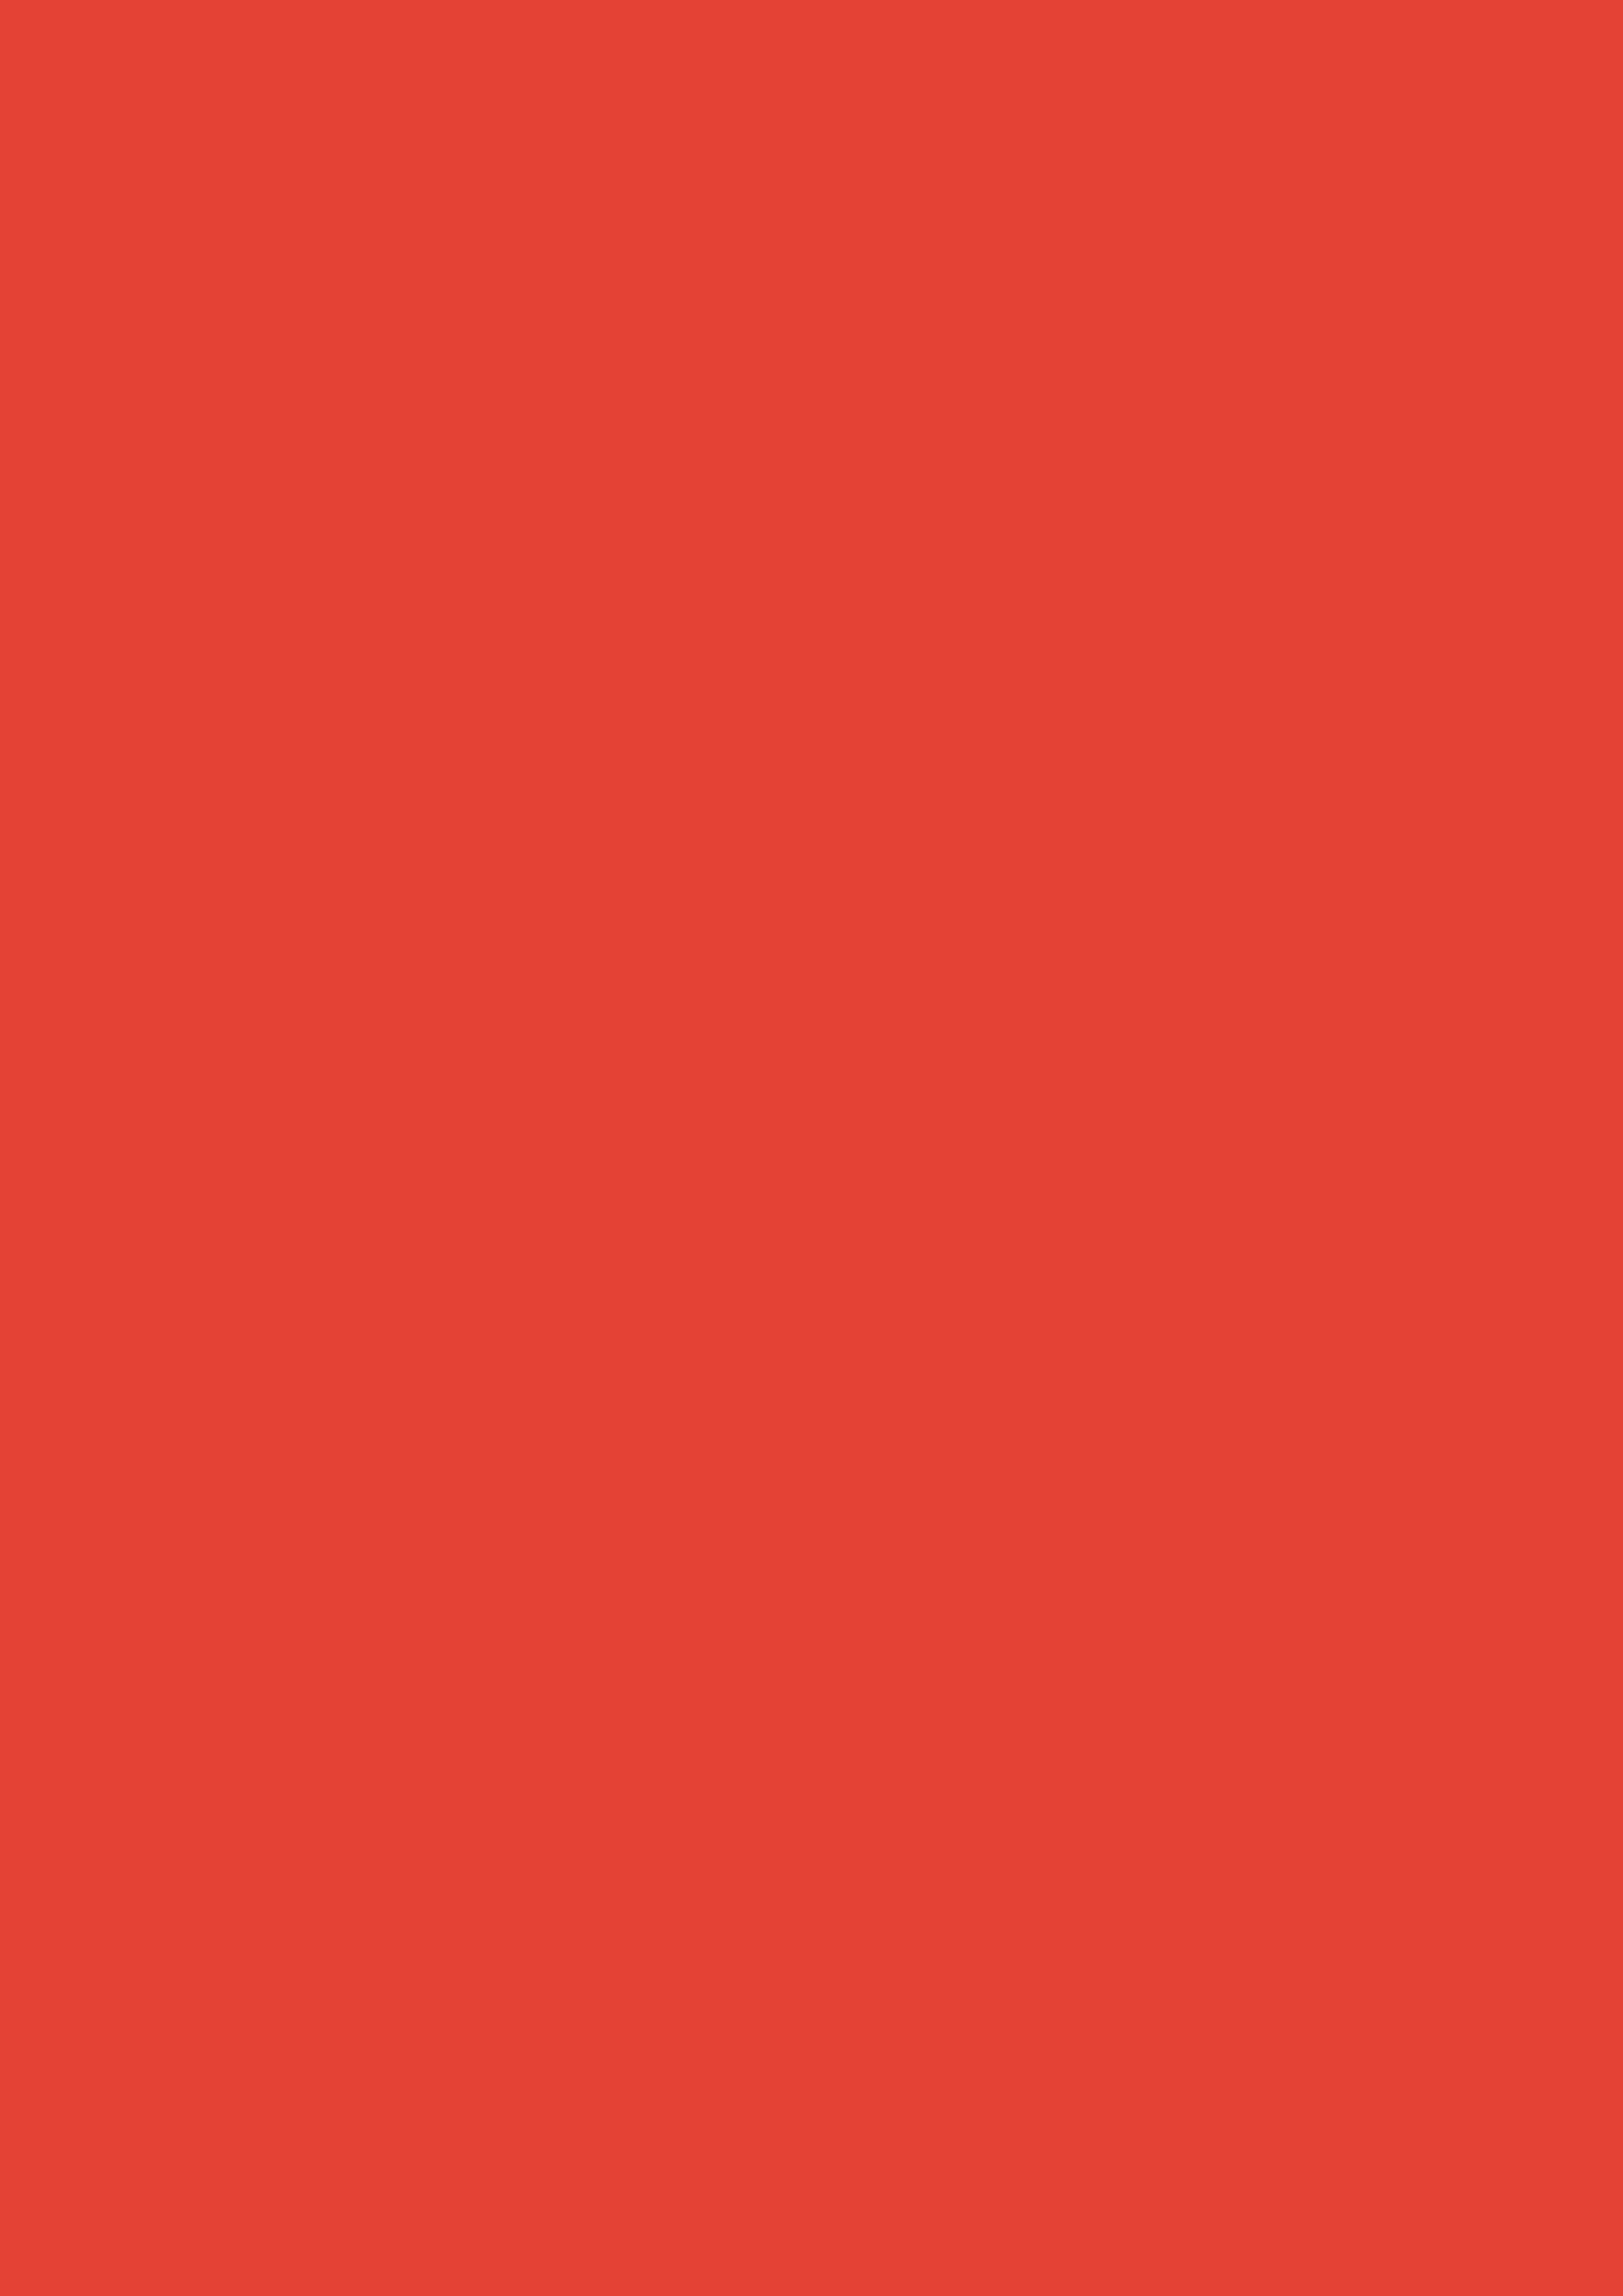 2480x3508 Vermilion Cinnabar Solid Color Background